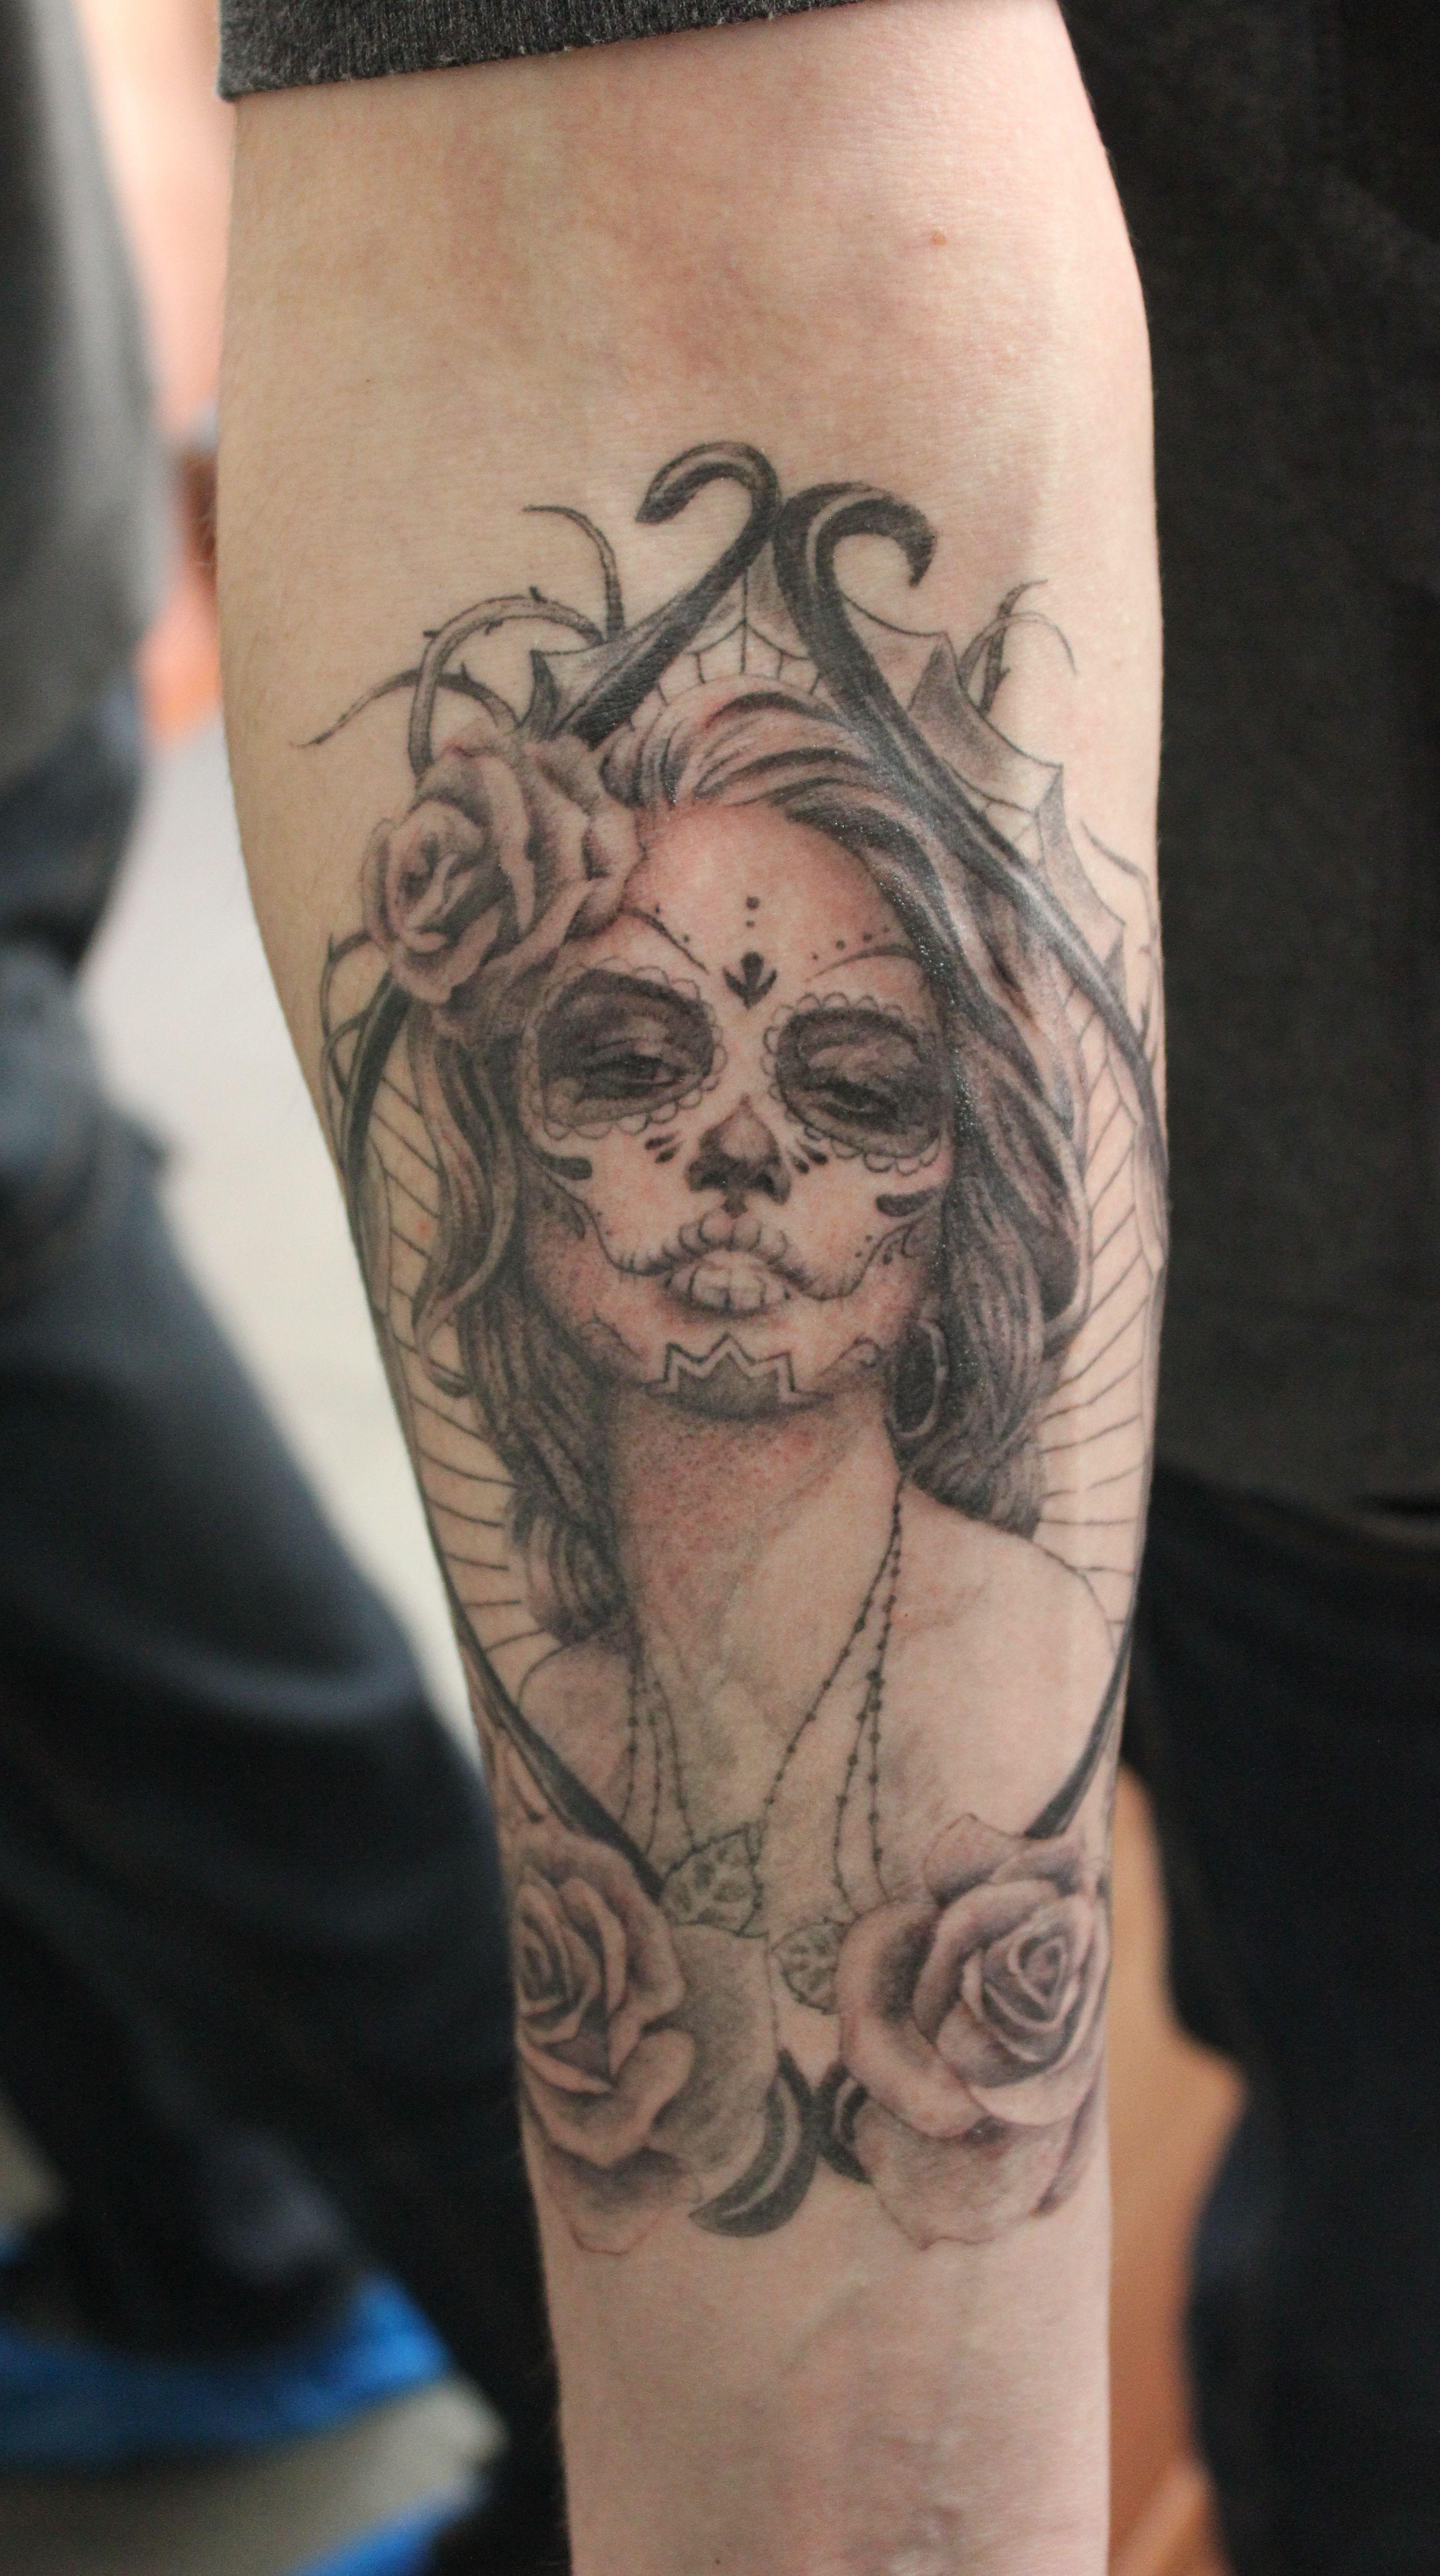 Santa muerte black and gray tattoo calavera pinterest black and gray tattoo izmirmasajfo